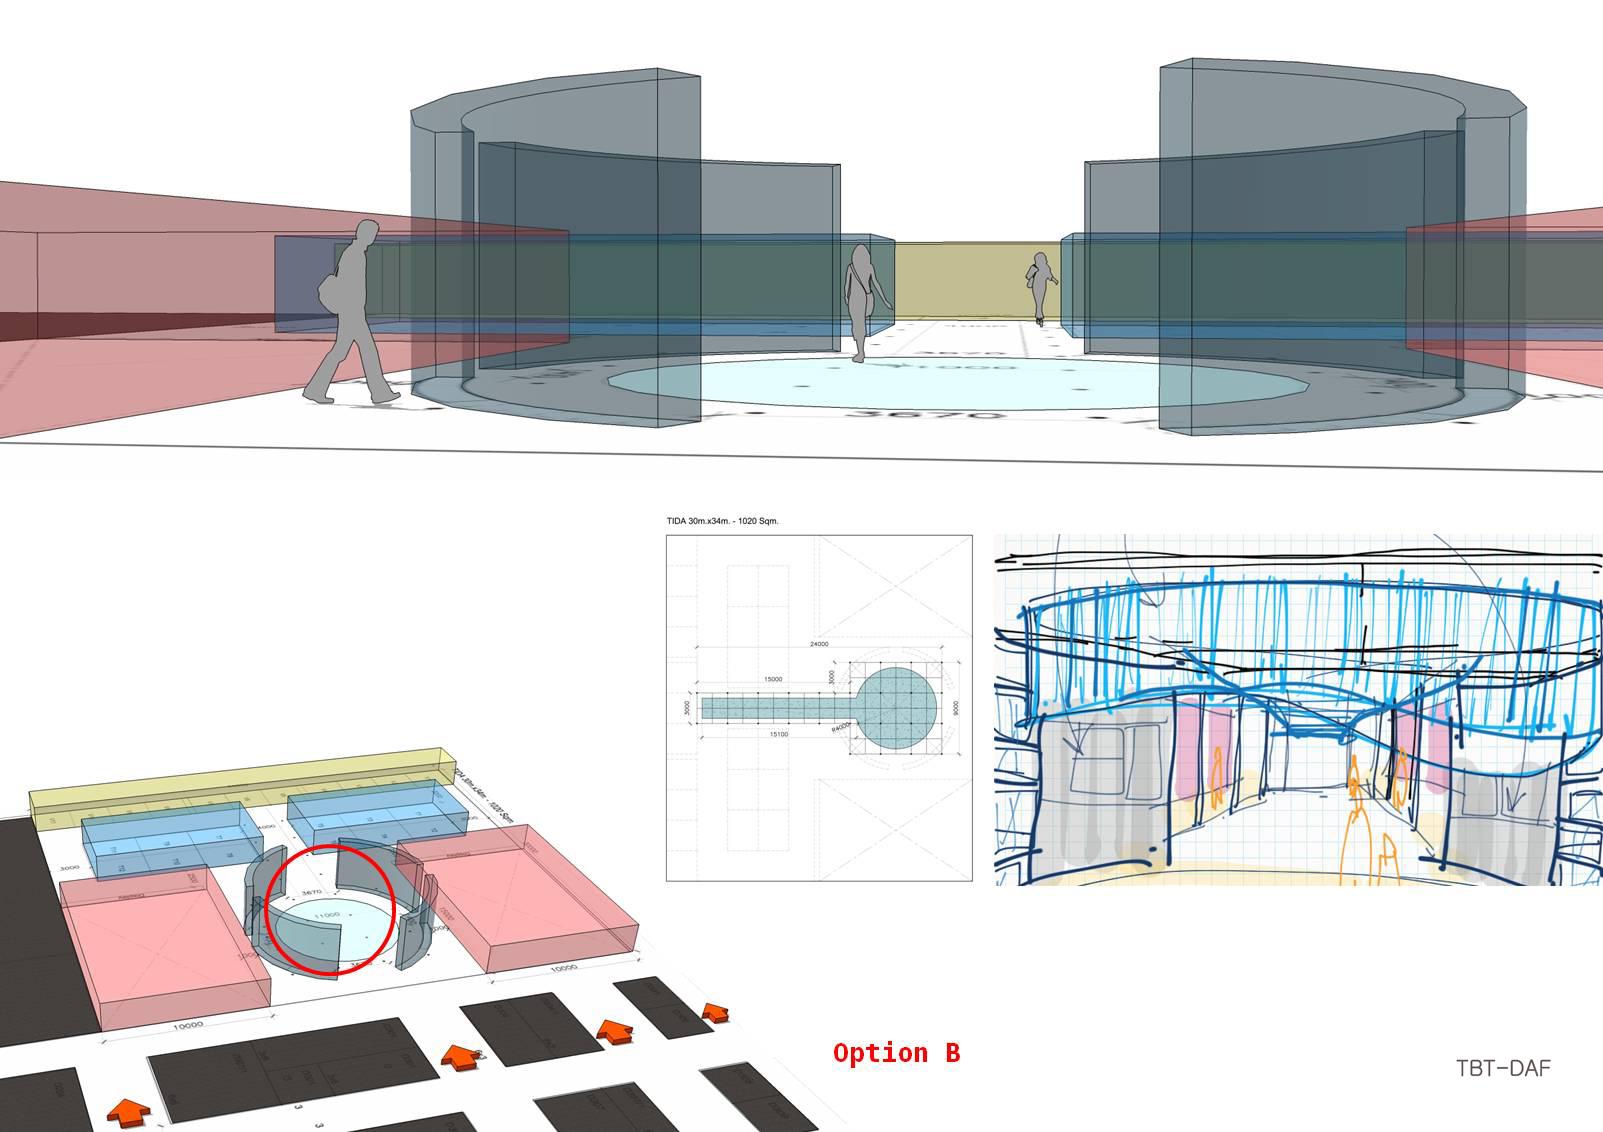 TBT-DAF interior design TIDA SALONE THAILAND 2012 14